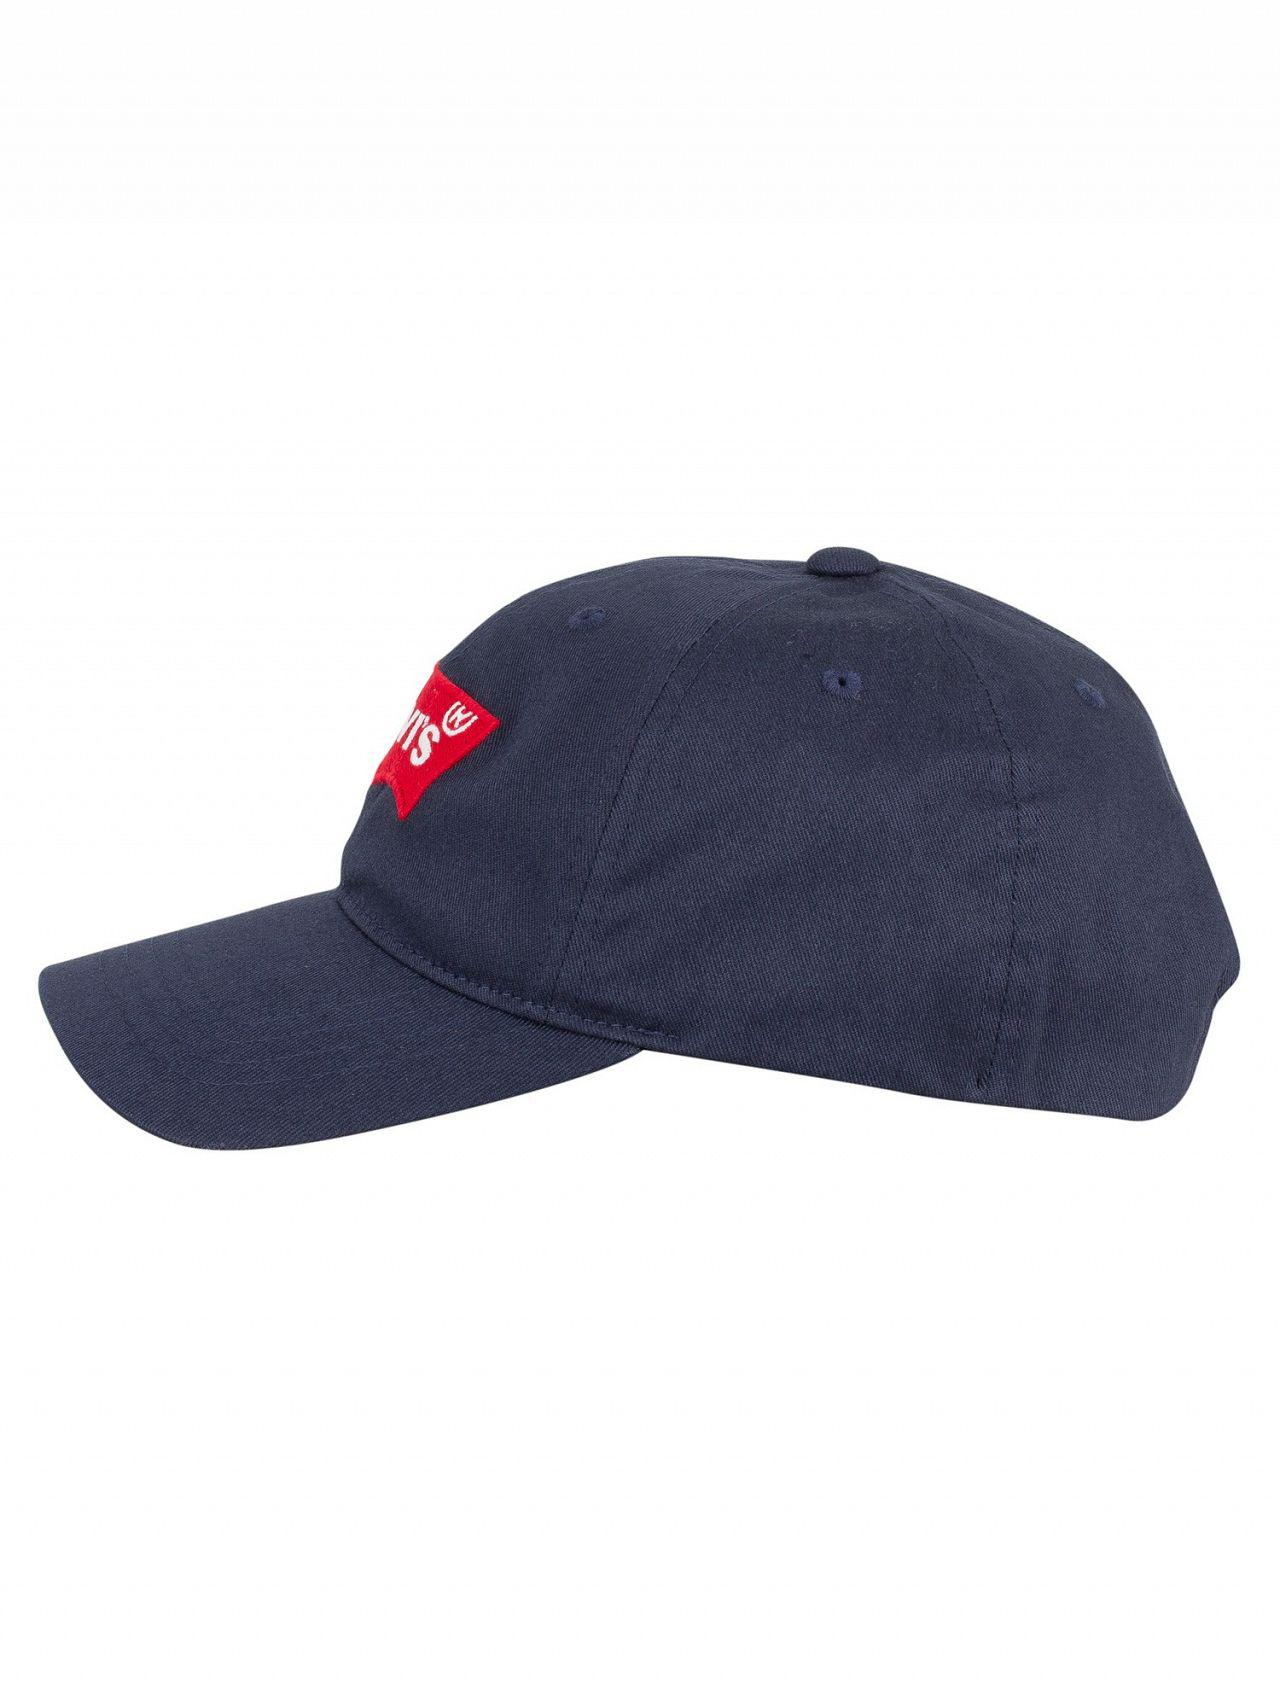 52887cc34e0f Levi's Navy Batwing Flex Fit Baseball Cap in Blue for Men - Lyst